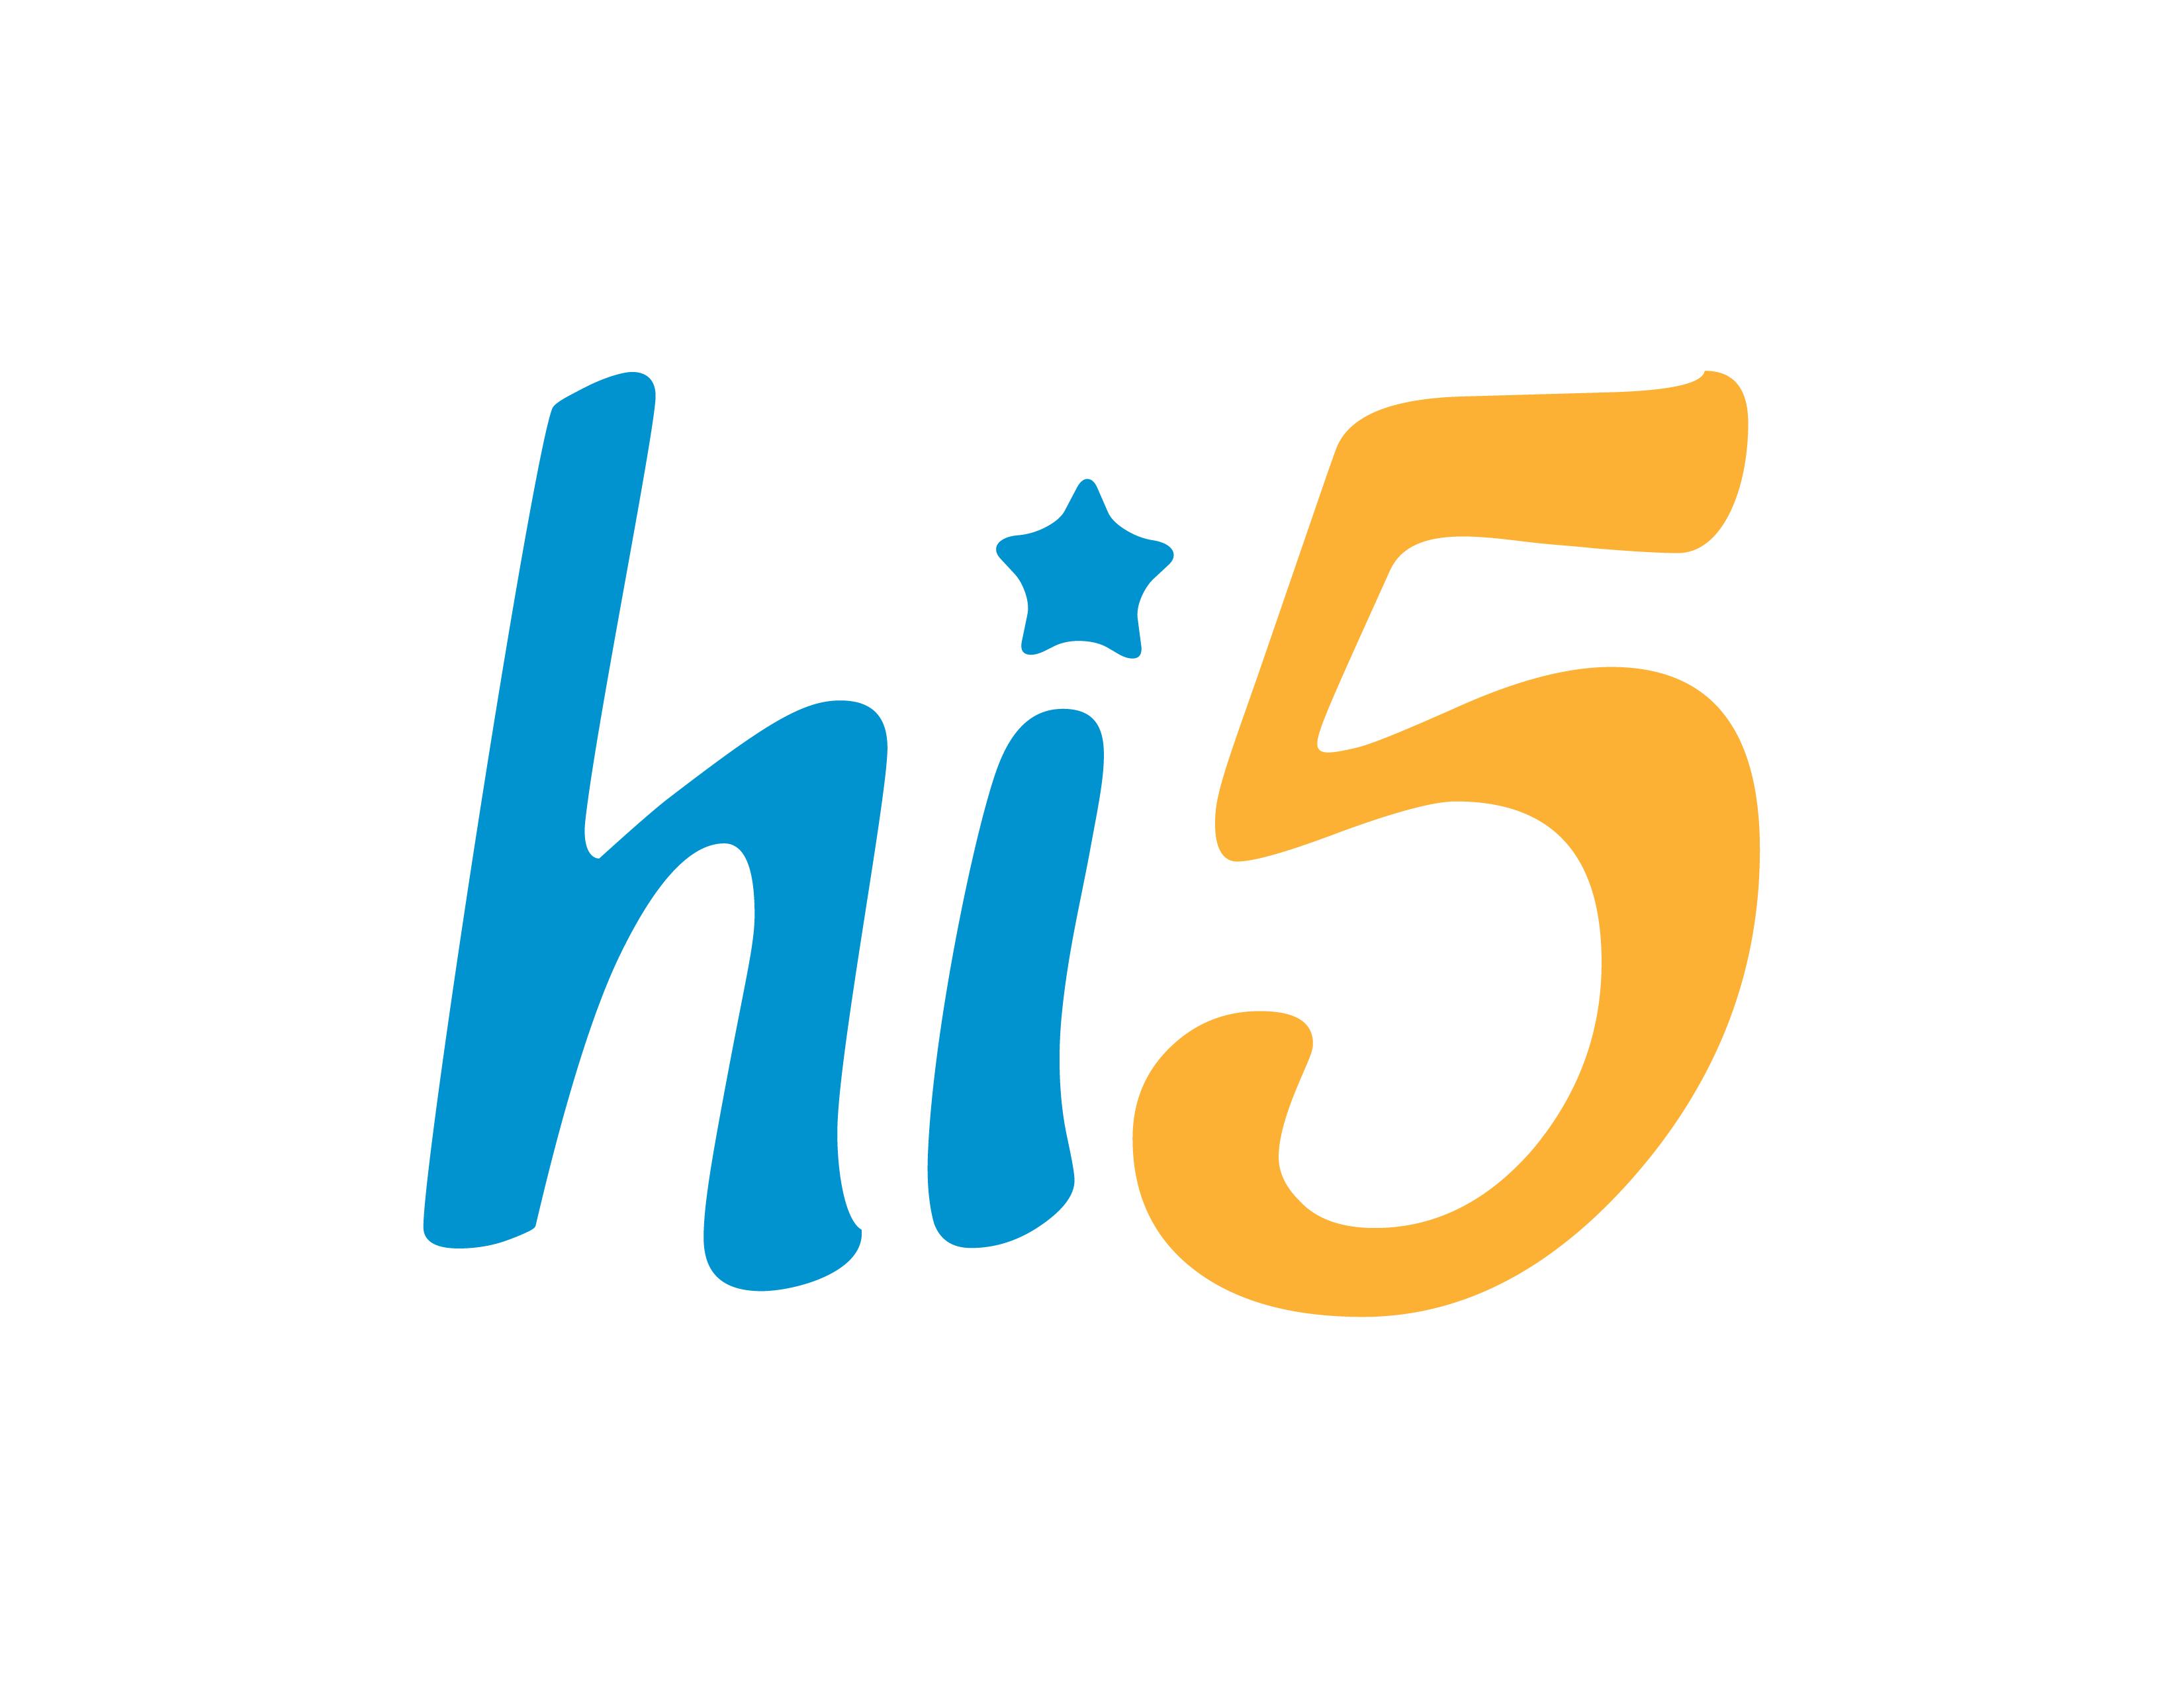 hi5-logo-large1 The Most Popular 15 Social Websites in The World